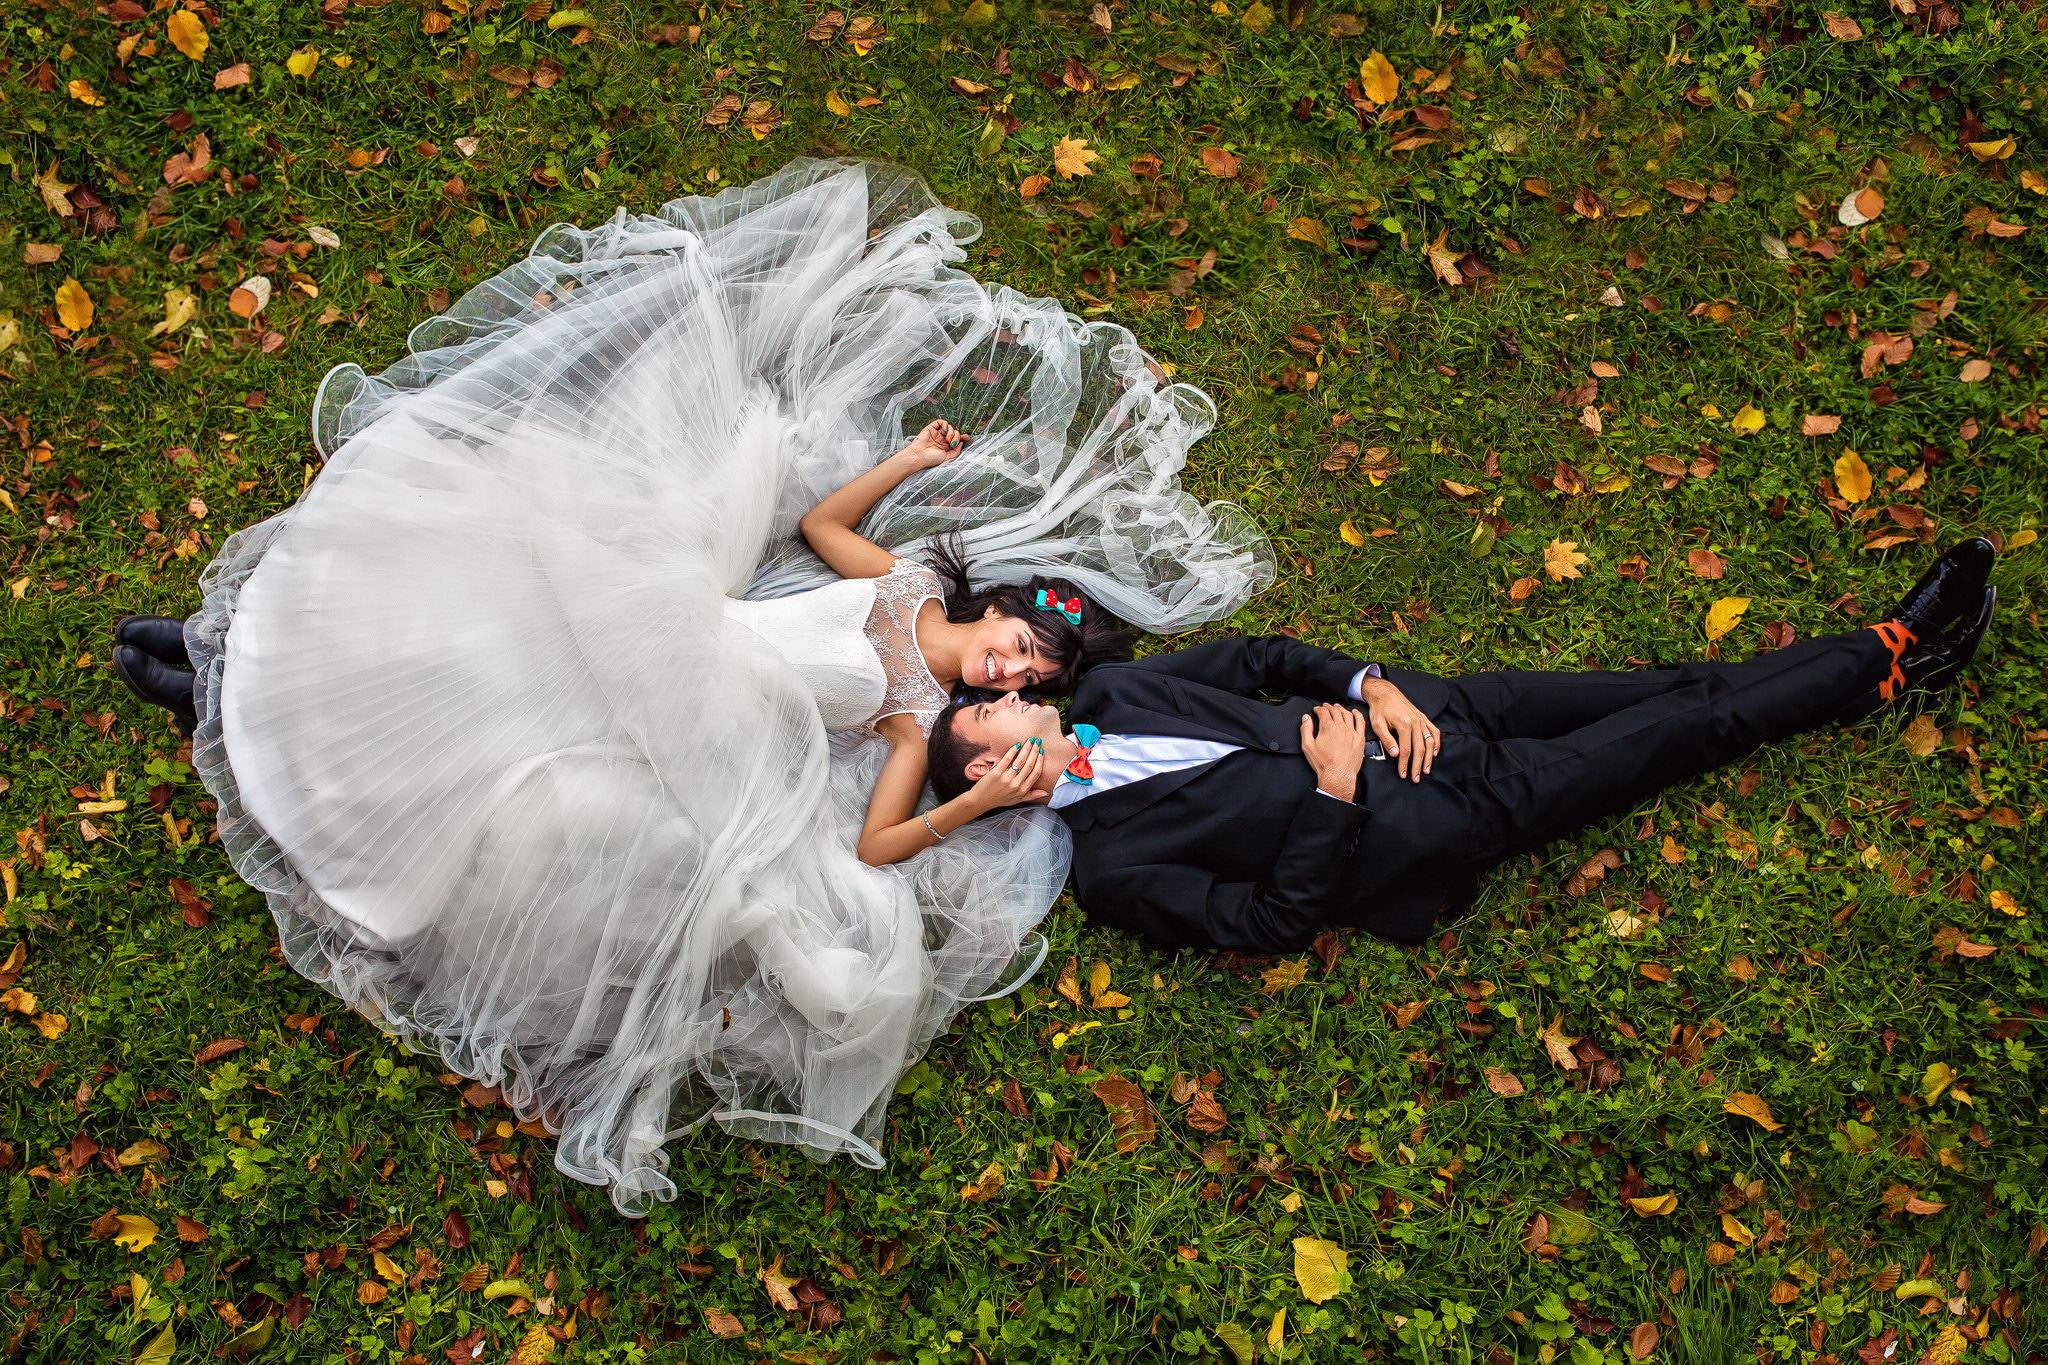 fotograf de nunta, fotograf nunta, fotograf Targoviste, fotograf Ploiesti, fotograf Bucuresti, fotografie de nunta, wedding, fotograf profesionist, foto nunta, poze nunta, trash the dress